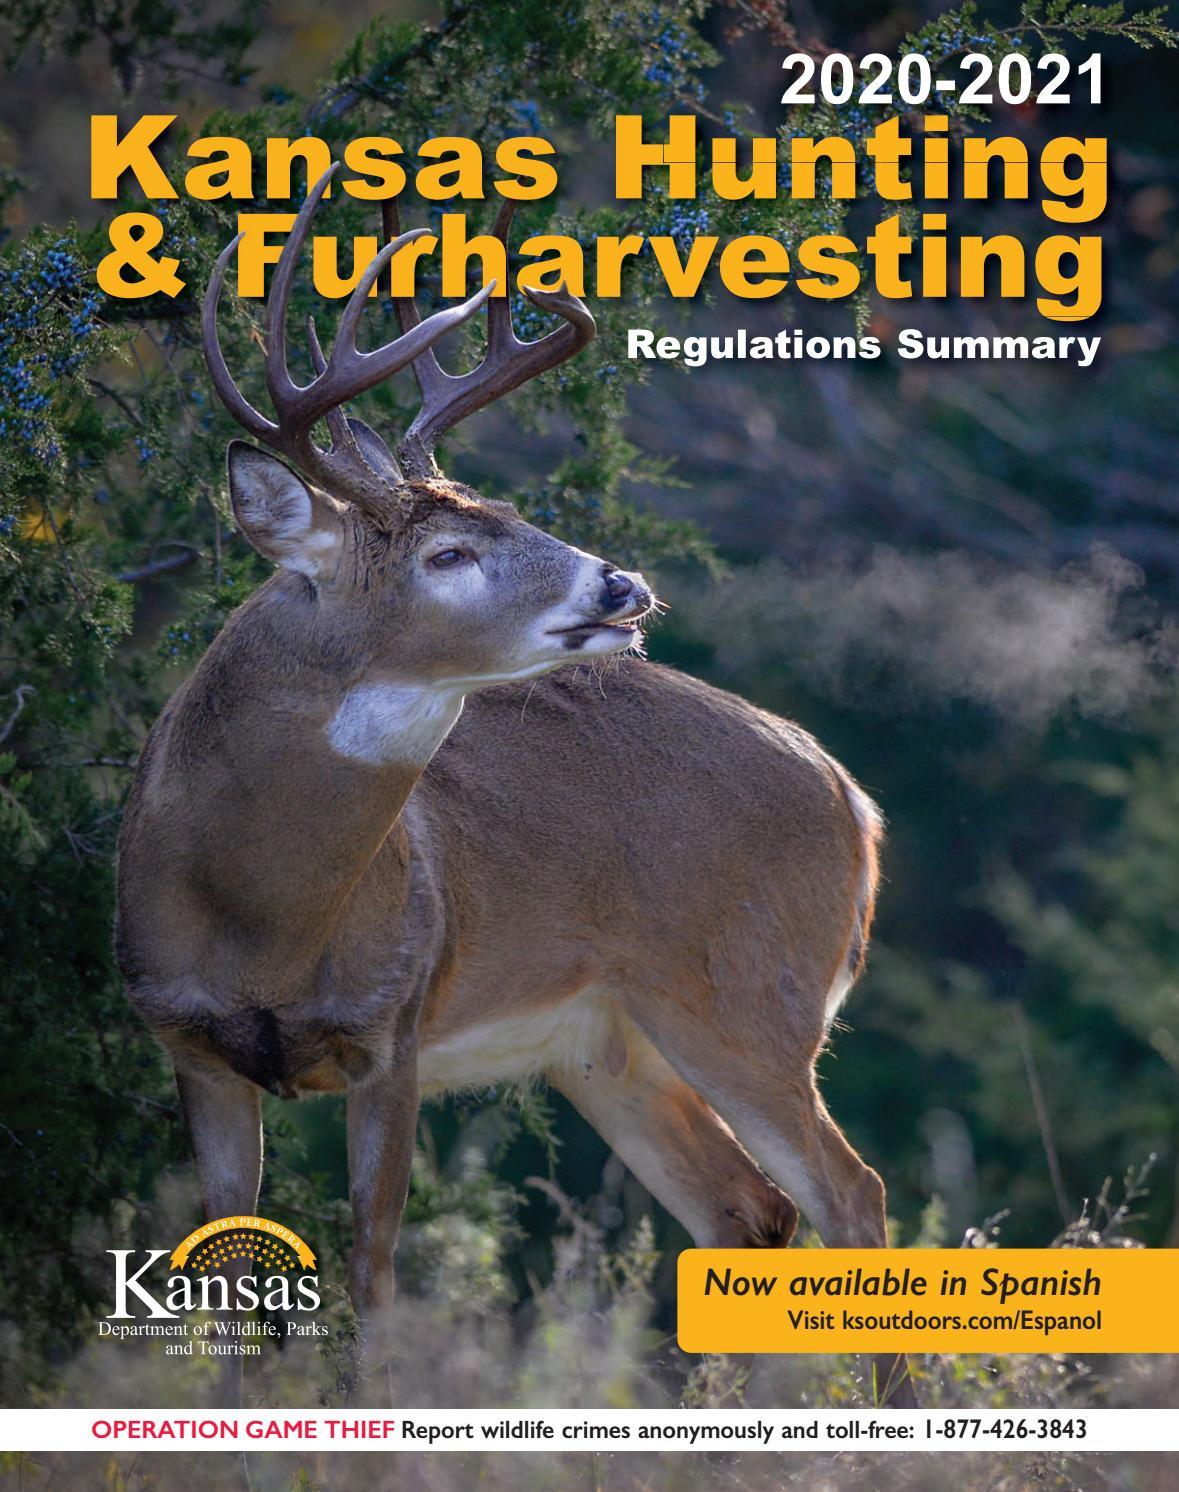 2020-2021 Kansas Hunting & Furharvesting Regulations Summary within 2021 Whitetail Deer Rut Predictions